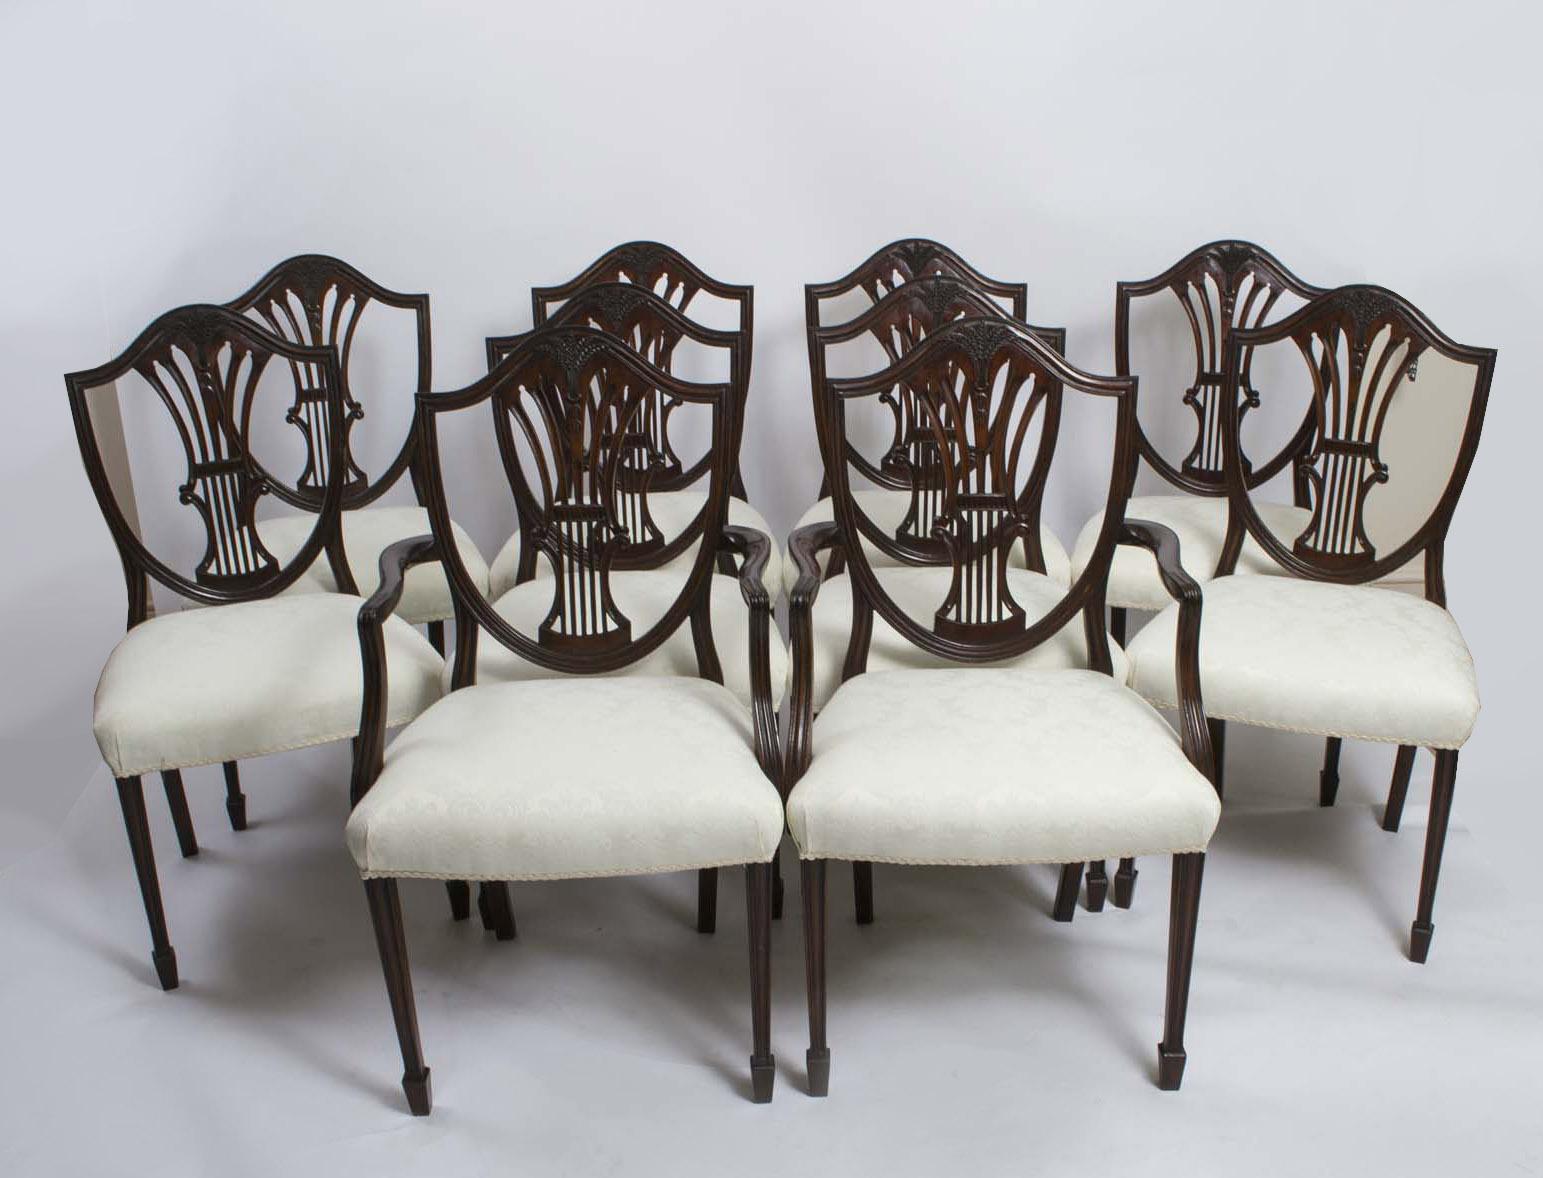 - Antique Set 10 Shieldback Mahogany Dining Chairs C.1900